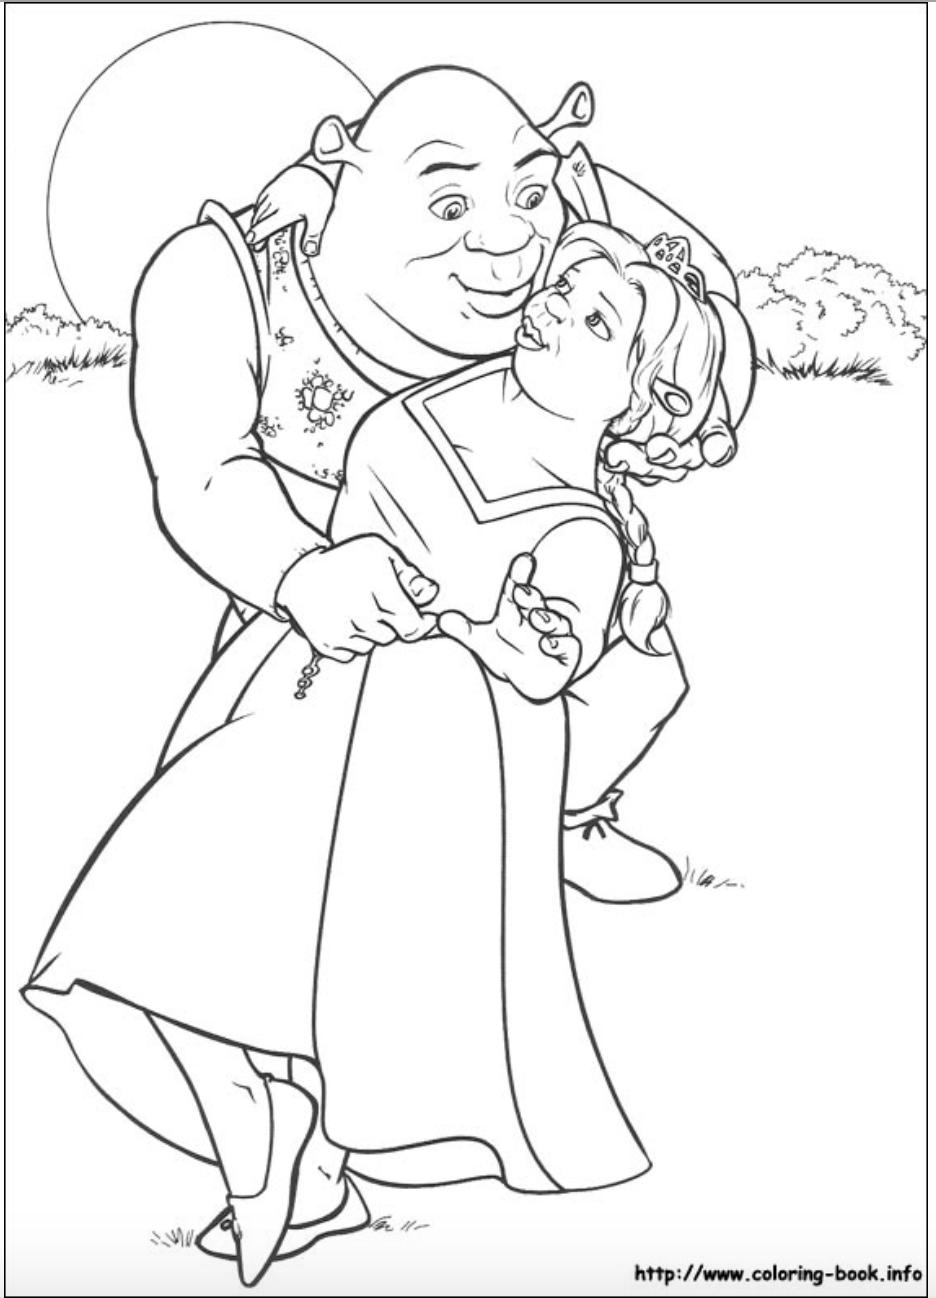 Shrek and Princess Fiona coloring page | Shrek | Pinterest | Shrek